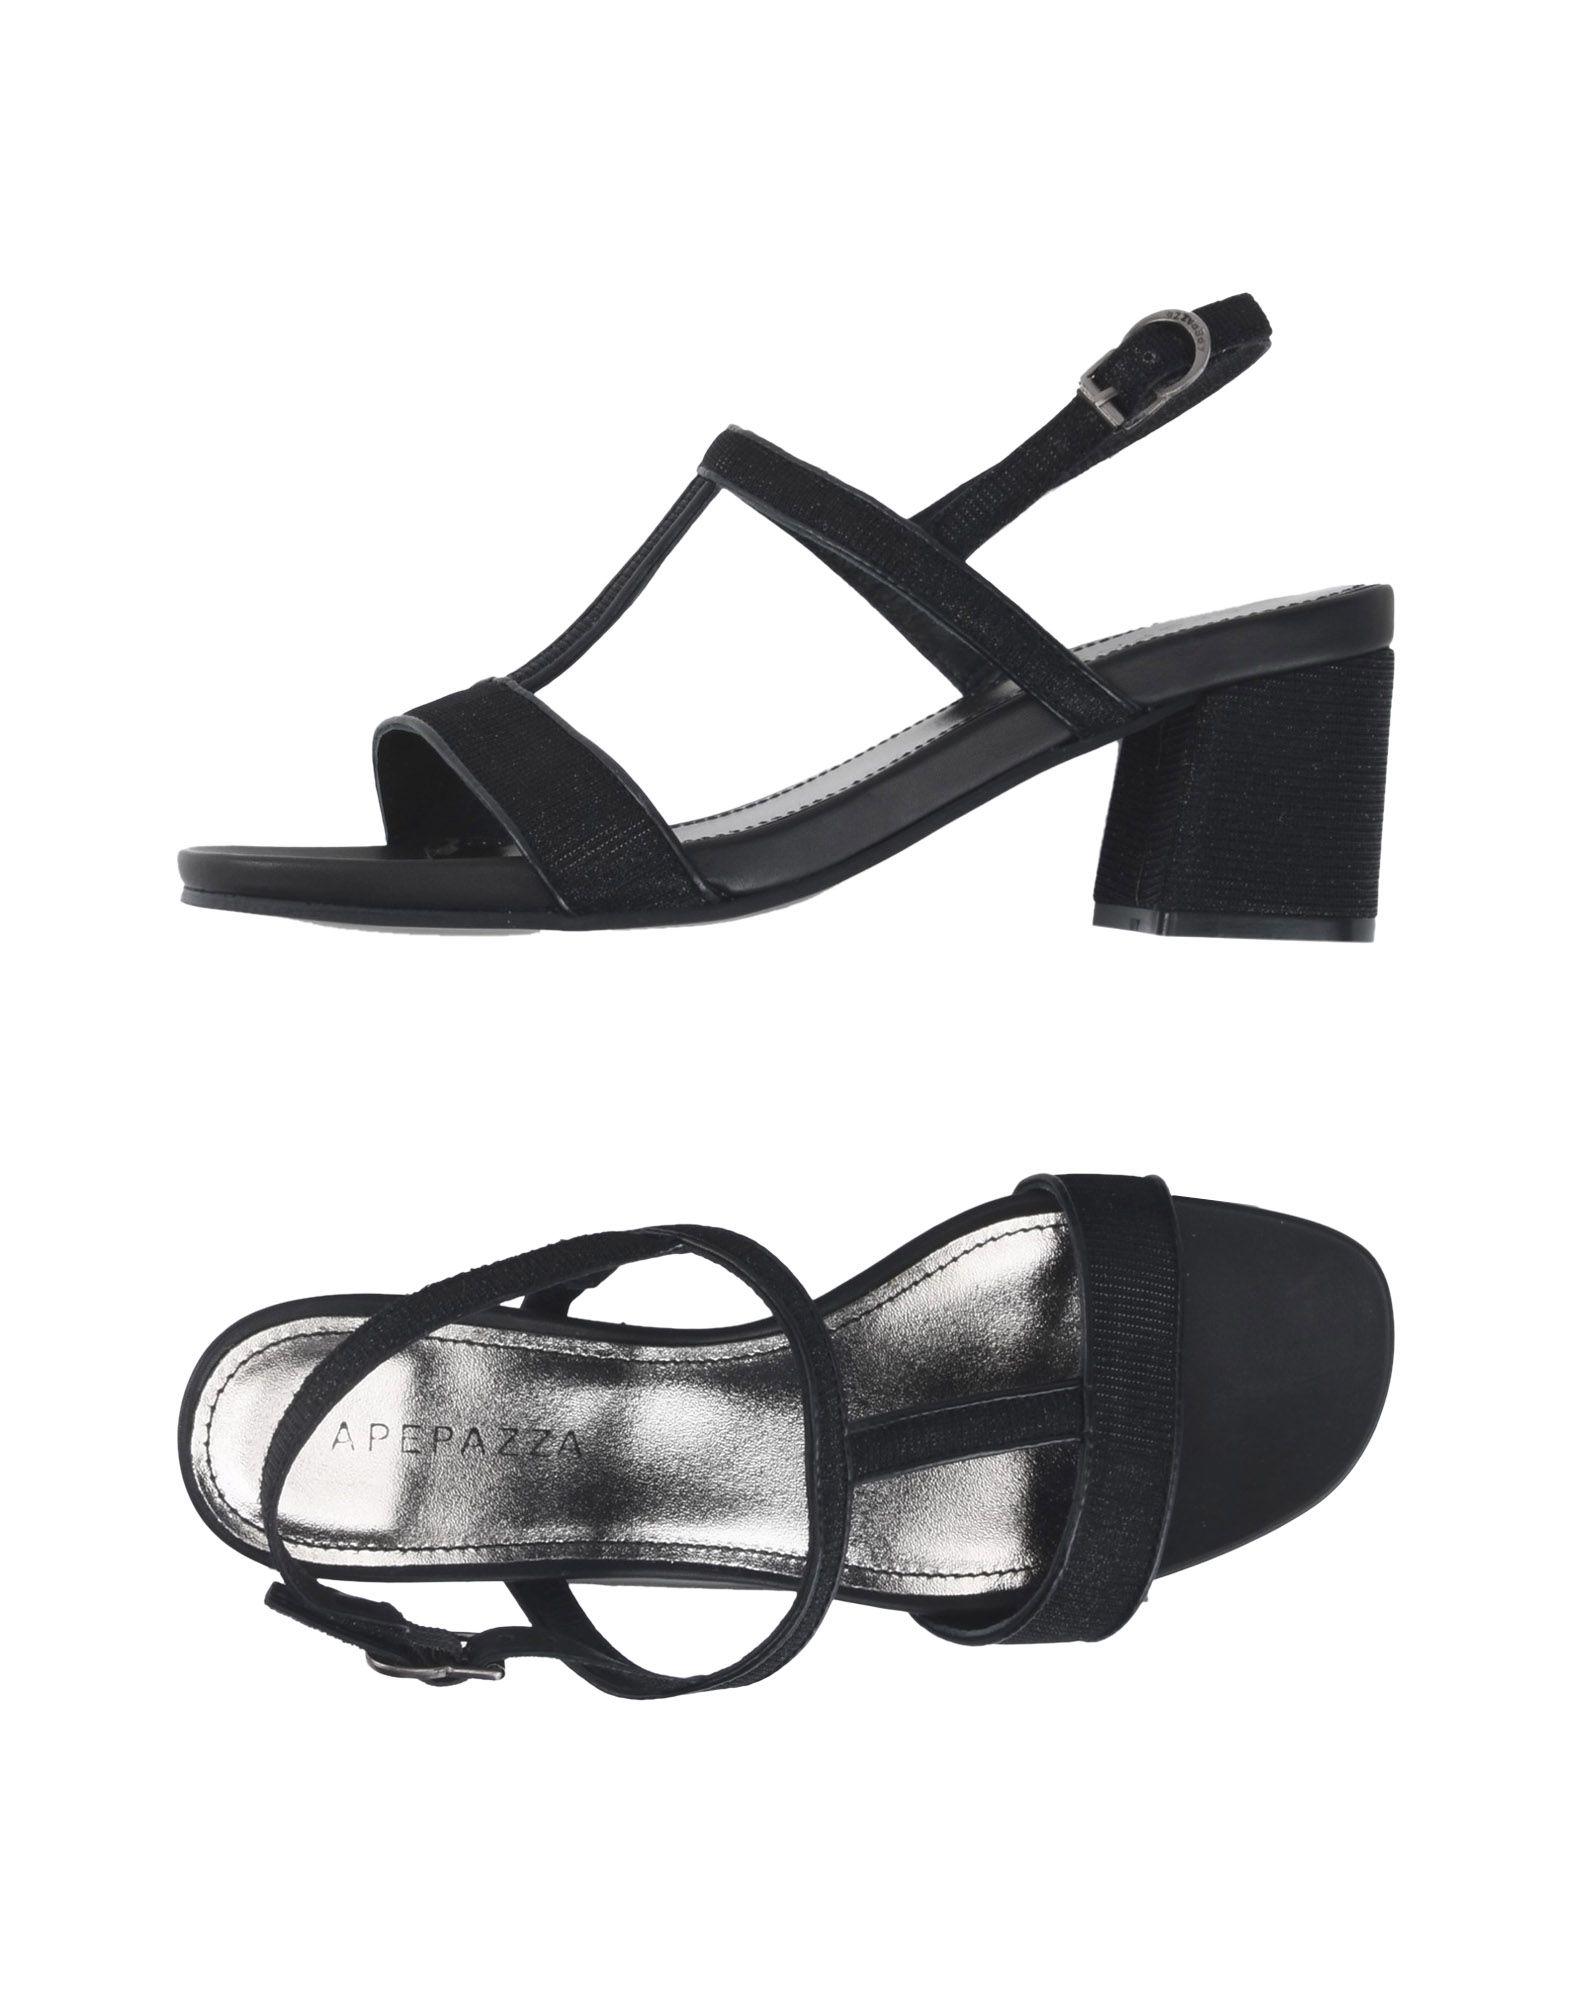 Apepazza Sandalen Gute Damen  11393918WF Gute Sandalen Qualität beliebte Schuhe 331469